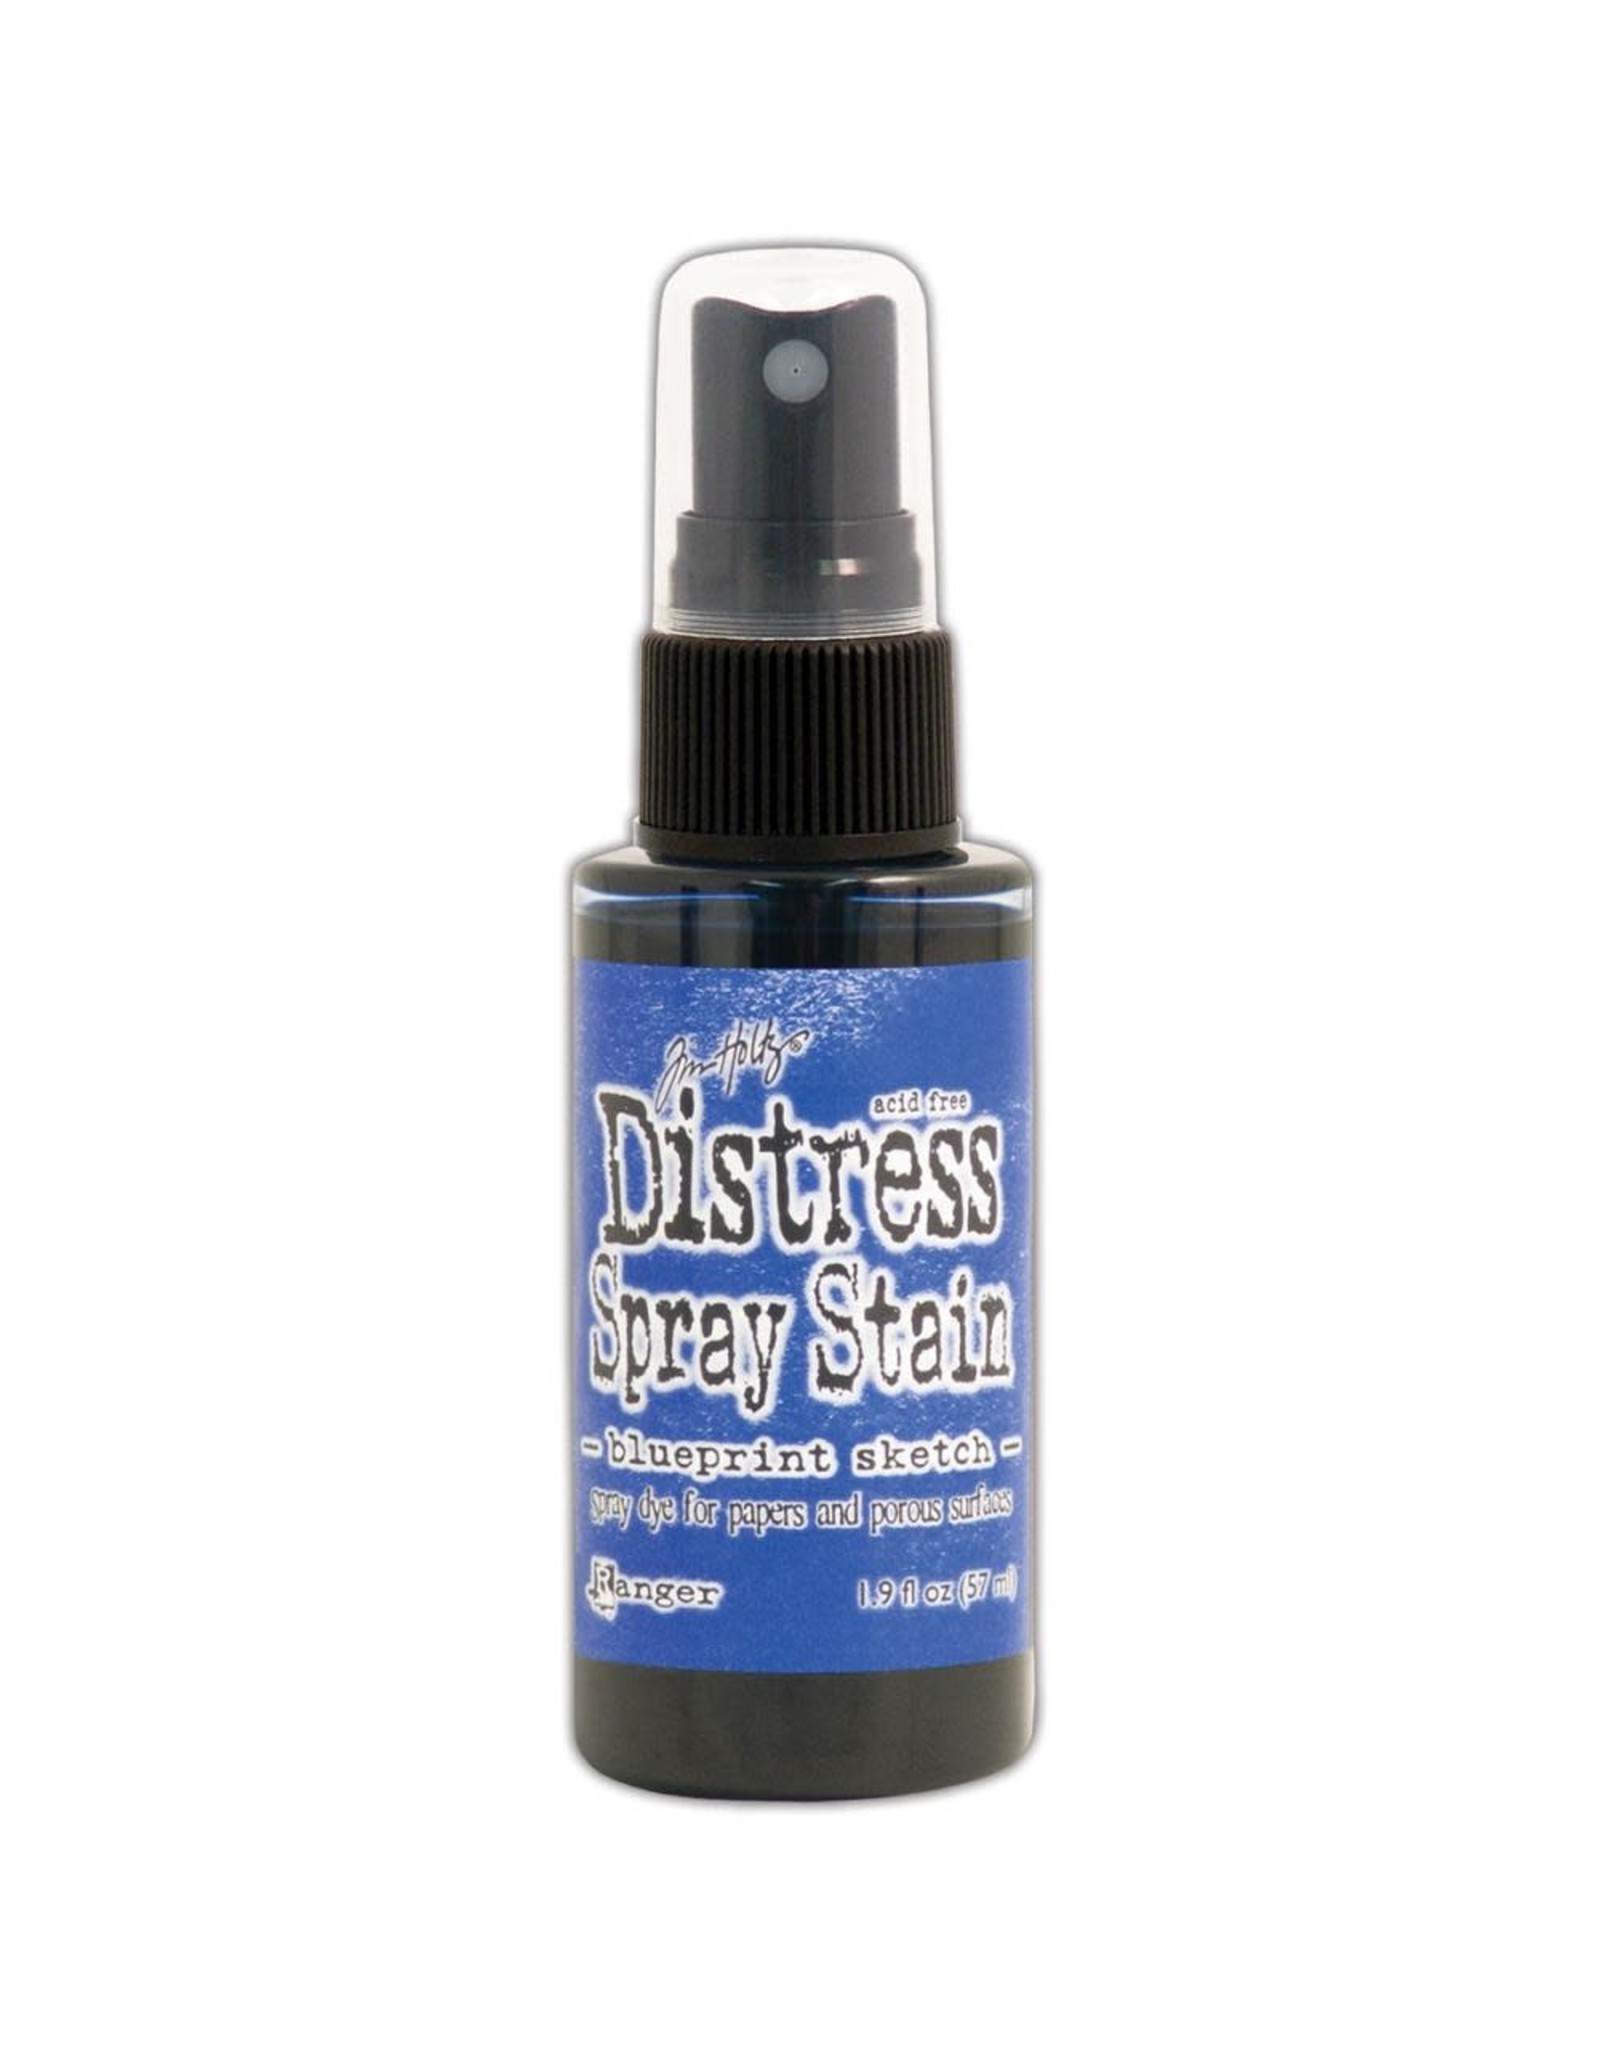 Ranger Distress Spray Stain - Blueprint Sketch